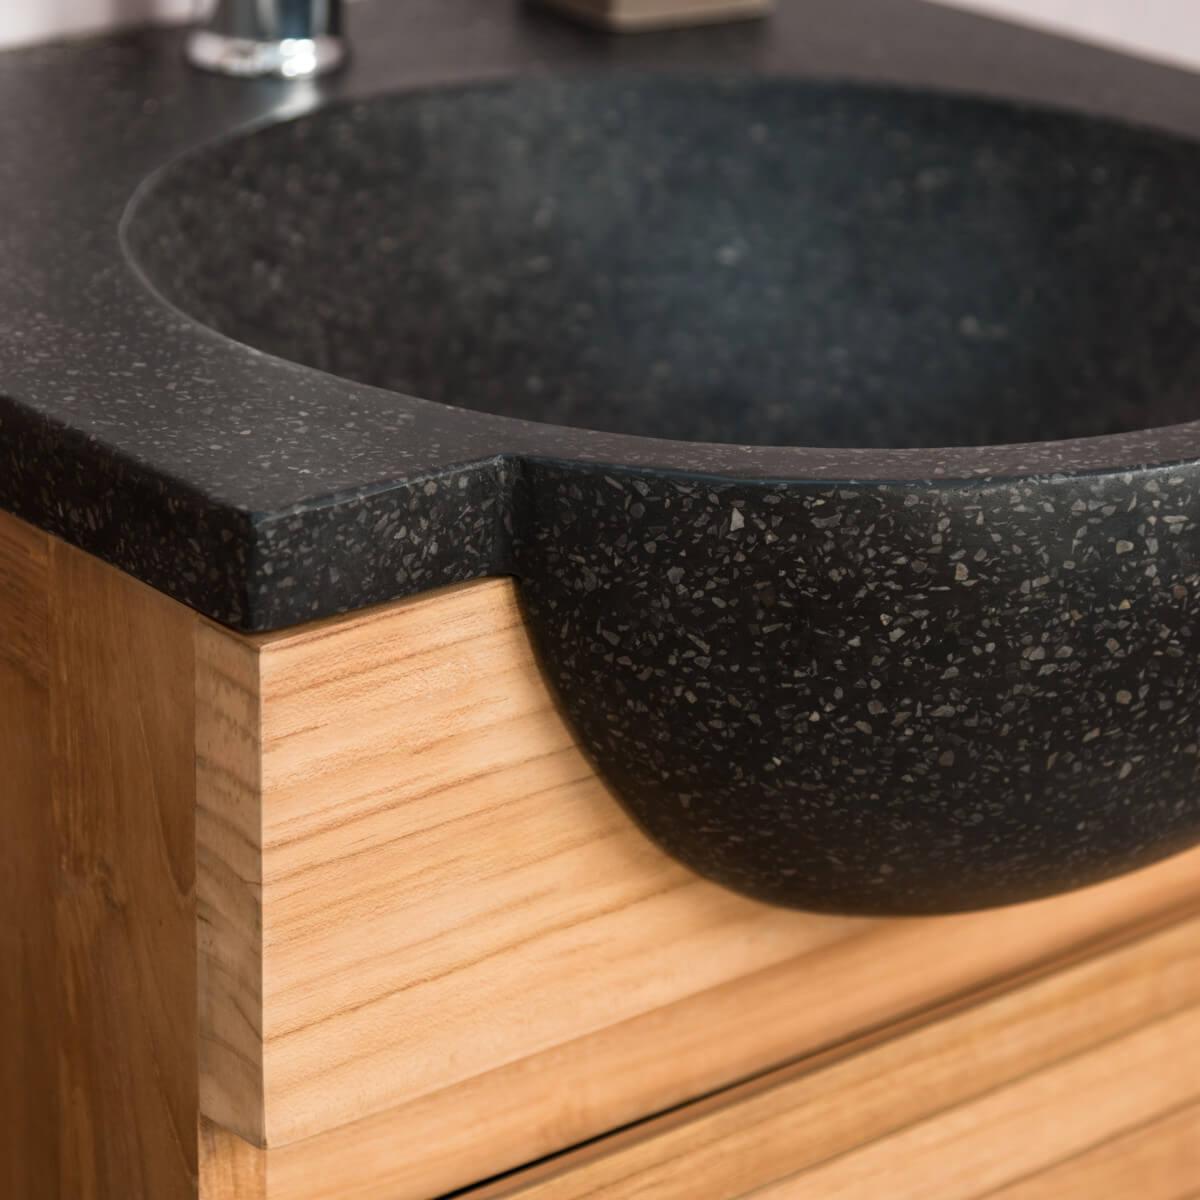 beautiful meuble vasque salle de bain 50 cm nature ideas With vasque salle de bain 50 cm